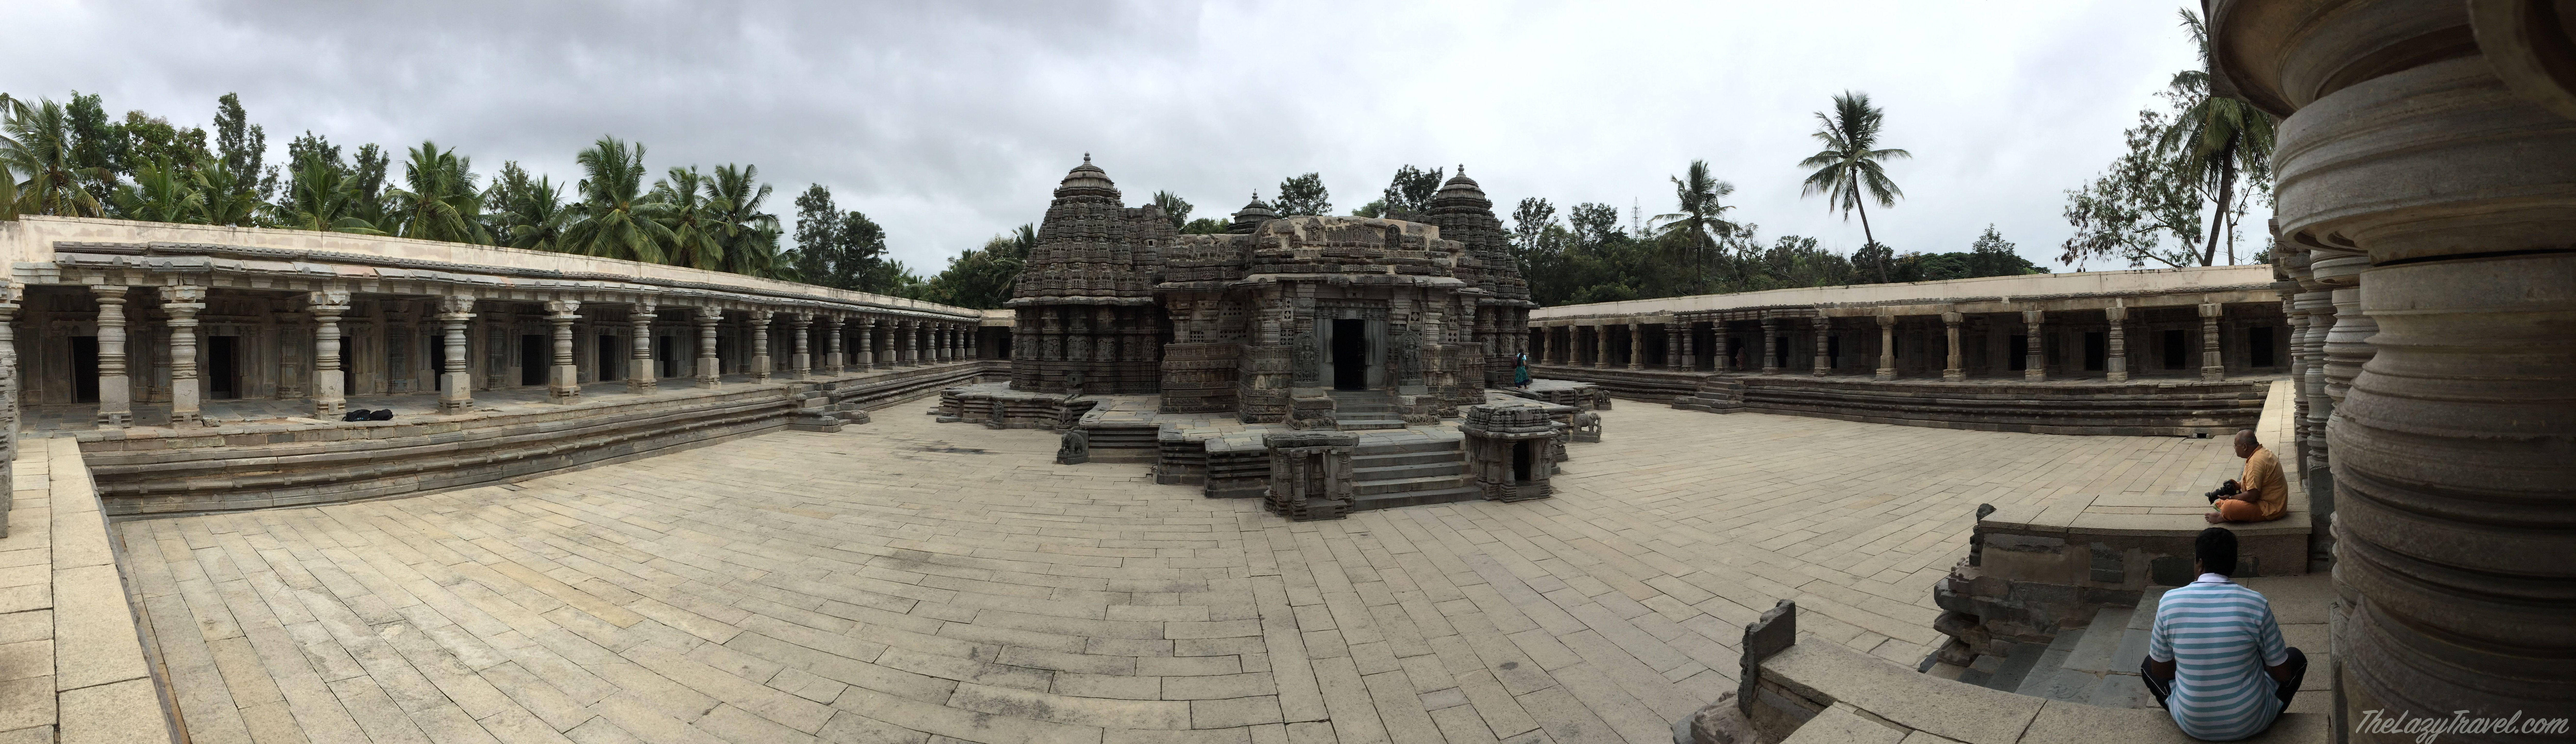 Chennakeshavatemple_Somnathpur1